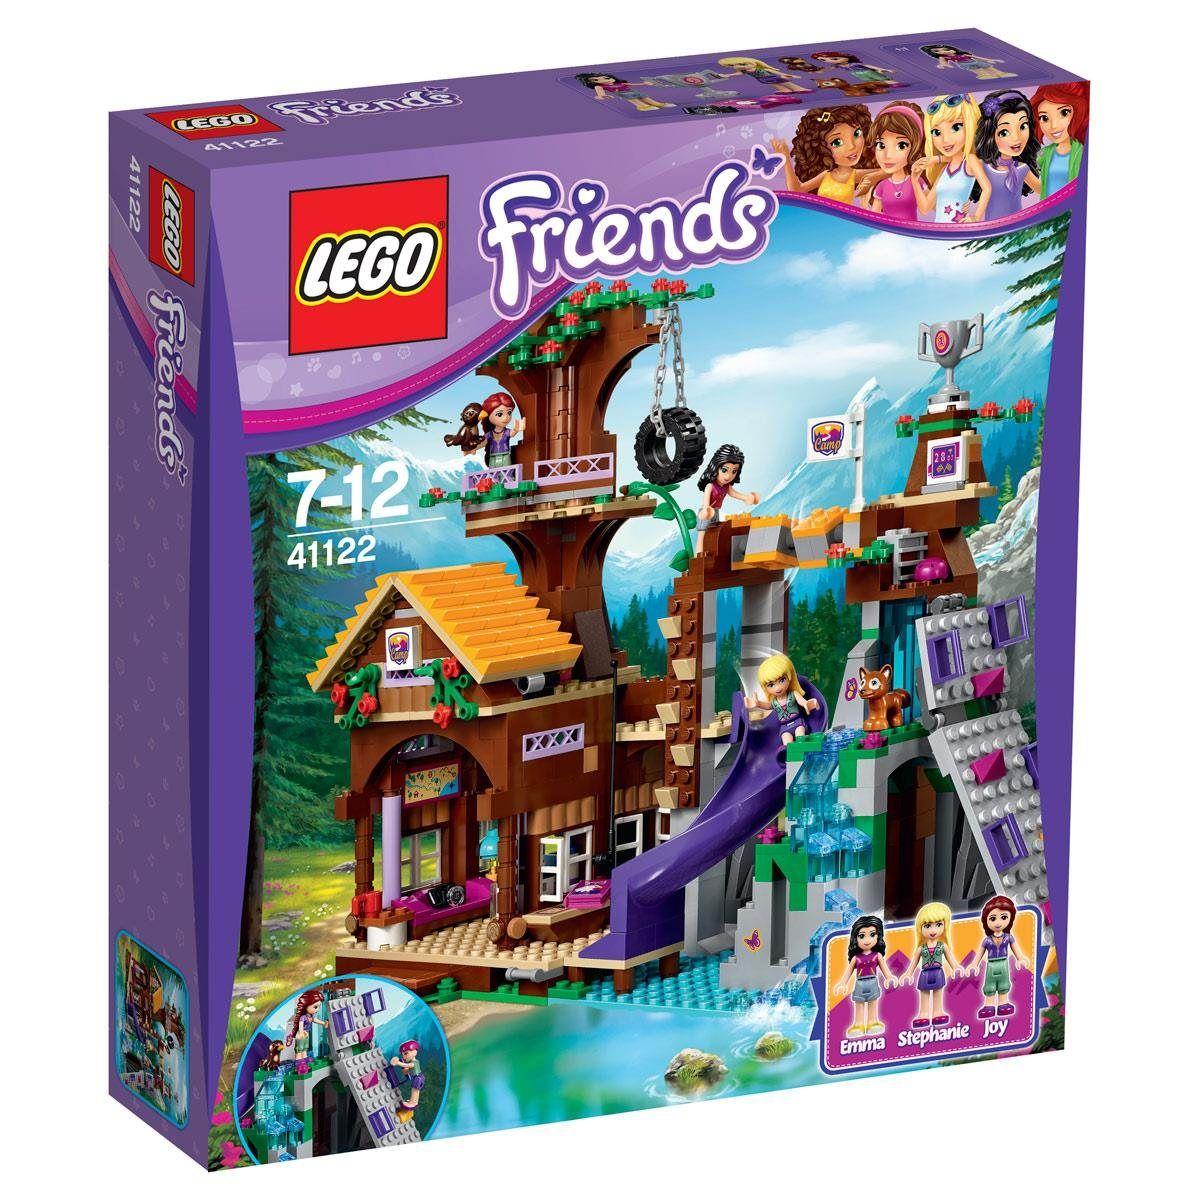 LEGO Friends Adventure Camp Tree House - 41122 | Kmart ...